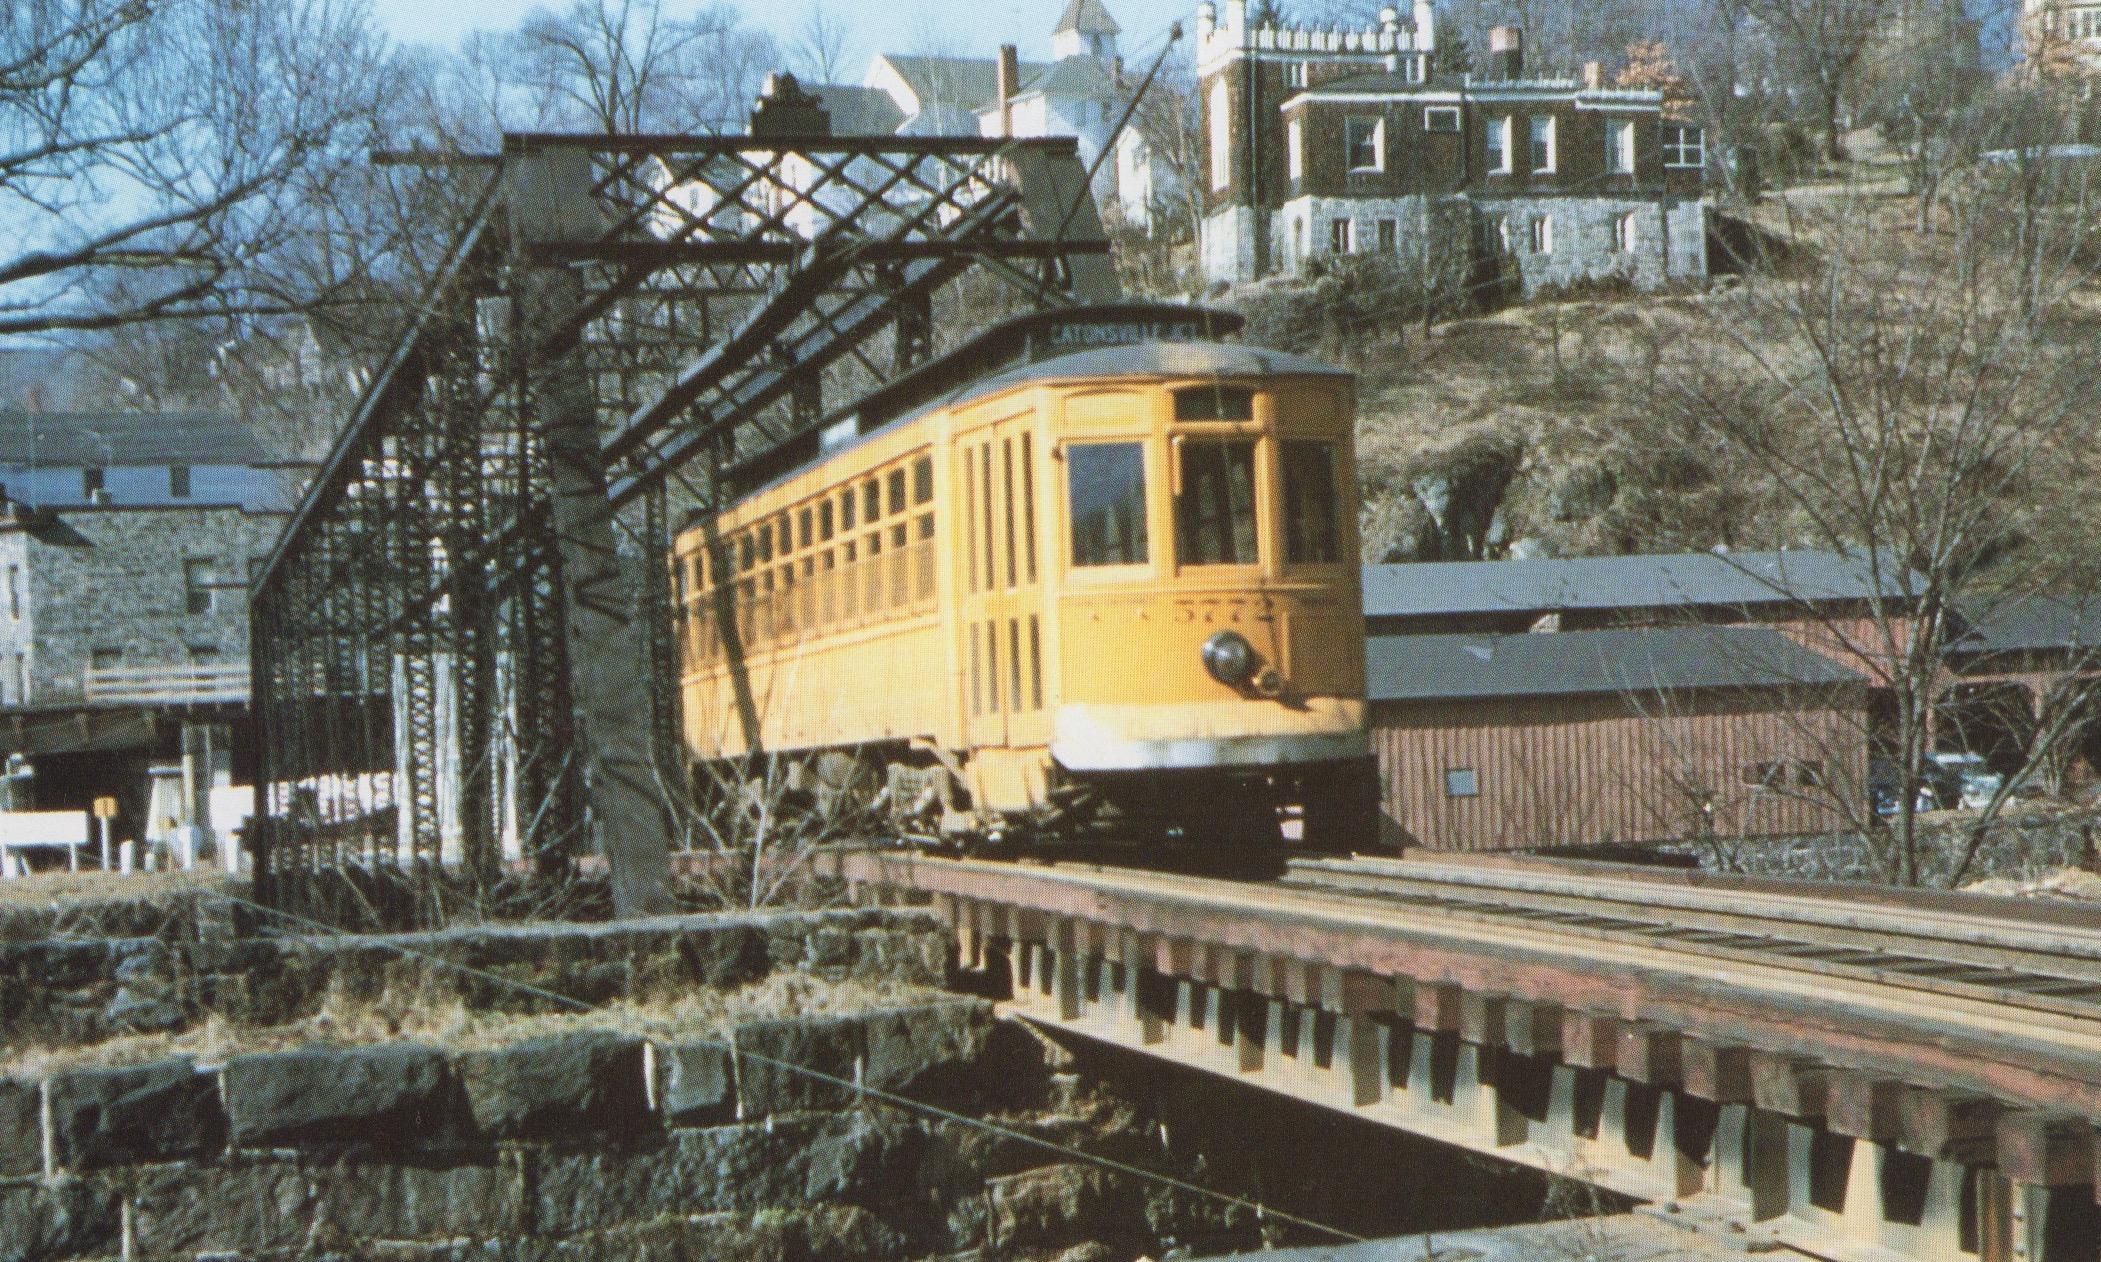 Image Credit: BSM Archive, Ellicott City Bridge, 1955